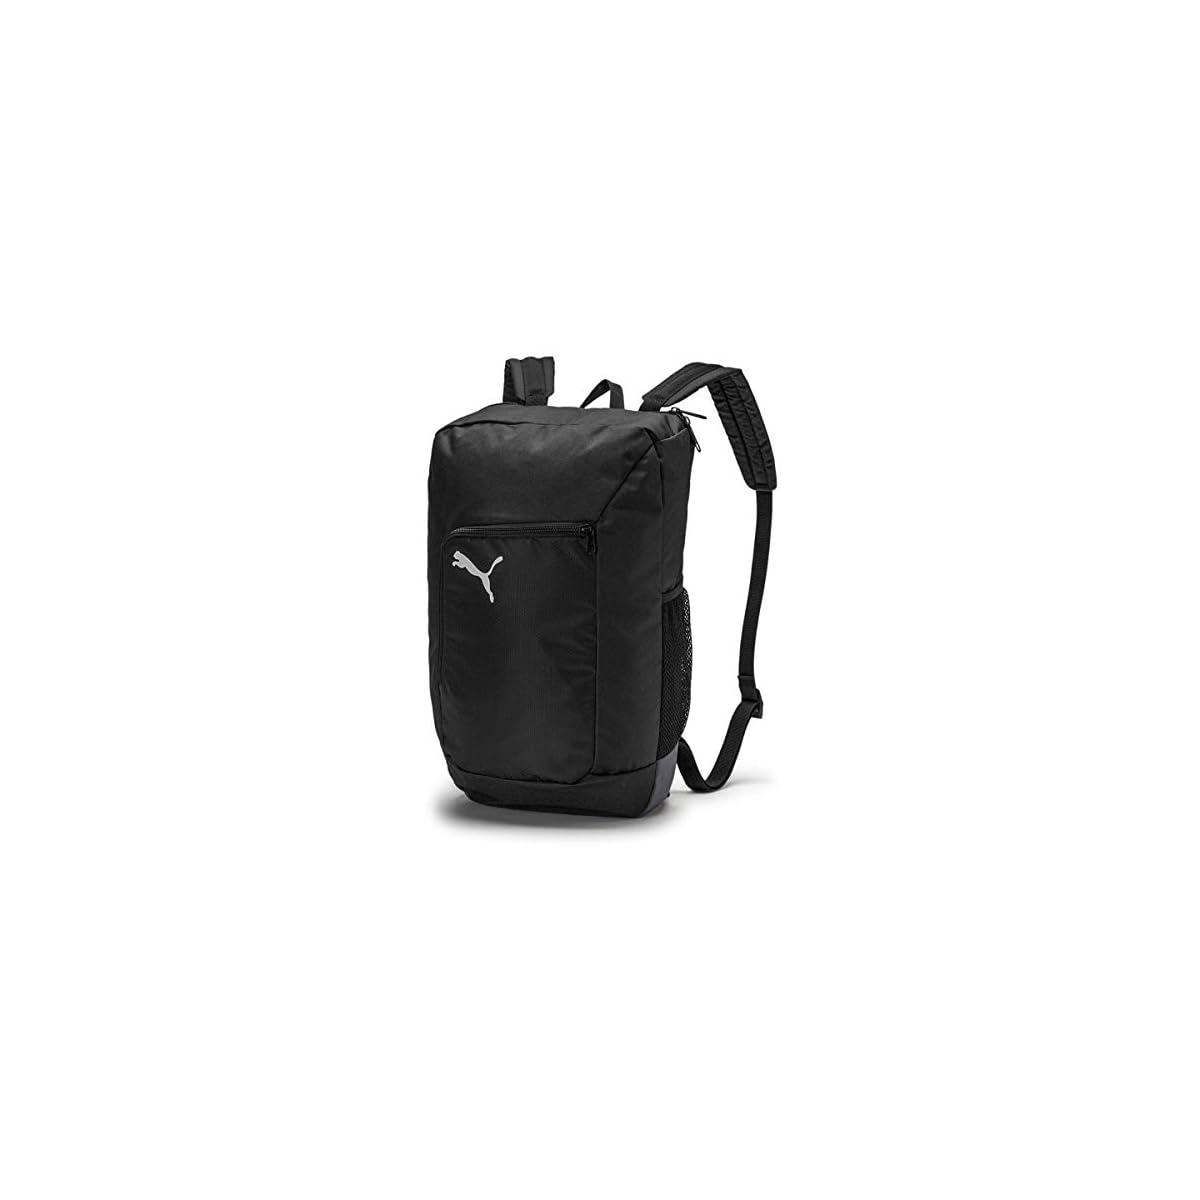 415VYPSN0dL. SS1200  - Puma ftblNXT Training Backpack Laptop Shool Sports 075894 01 Black